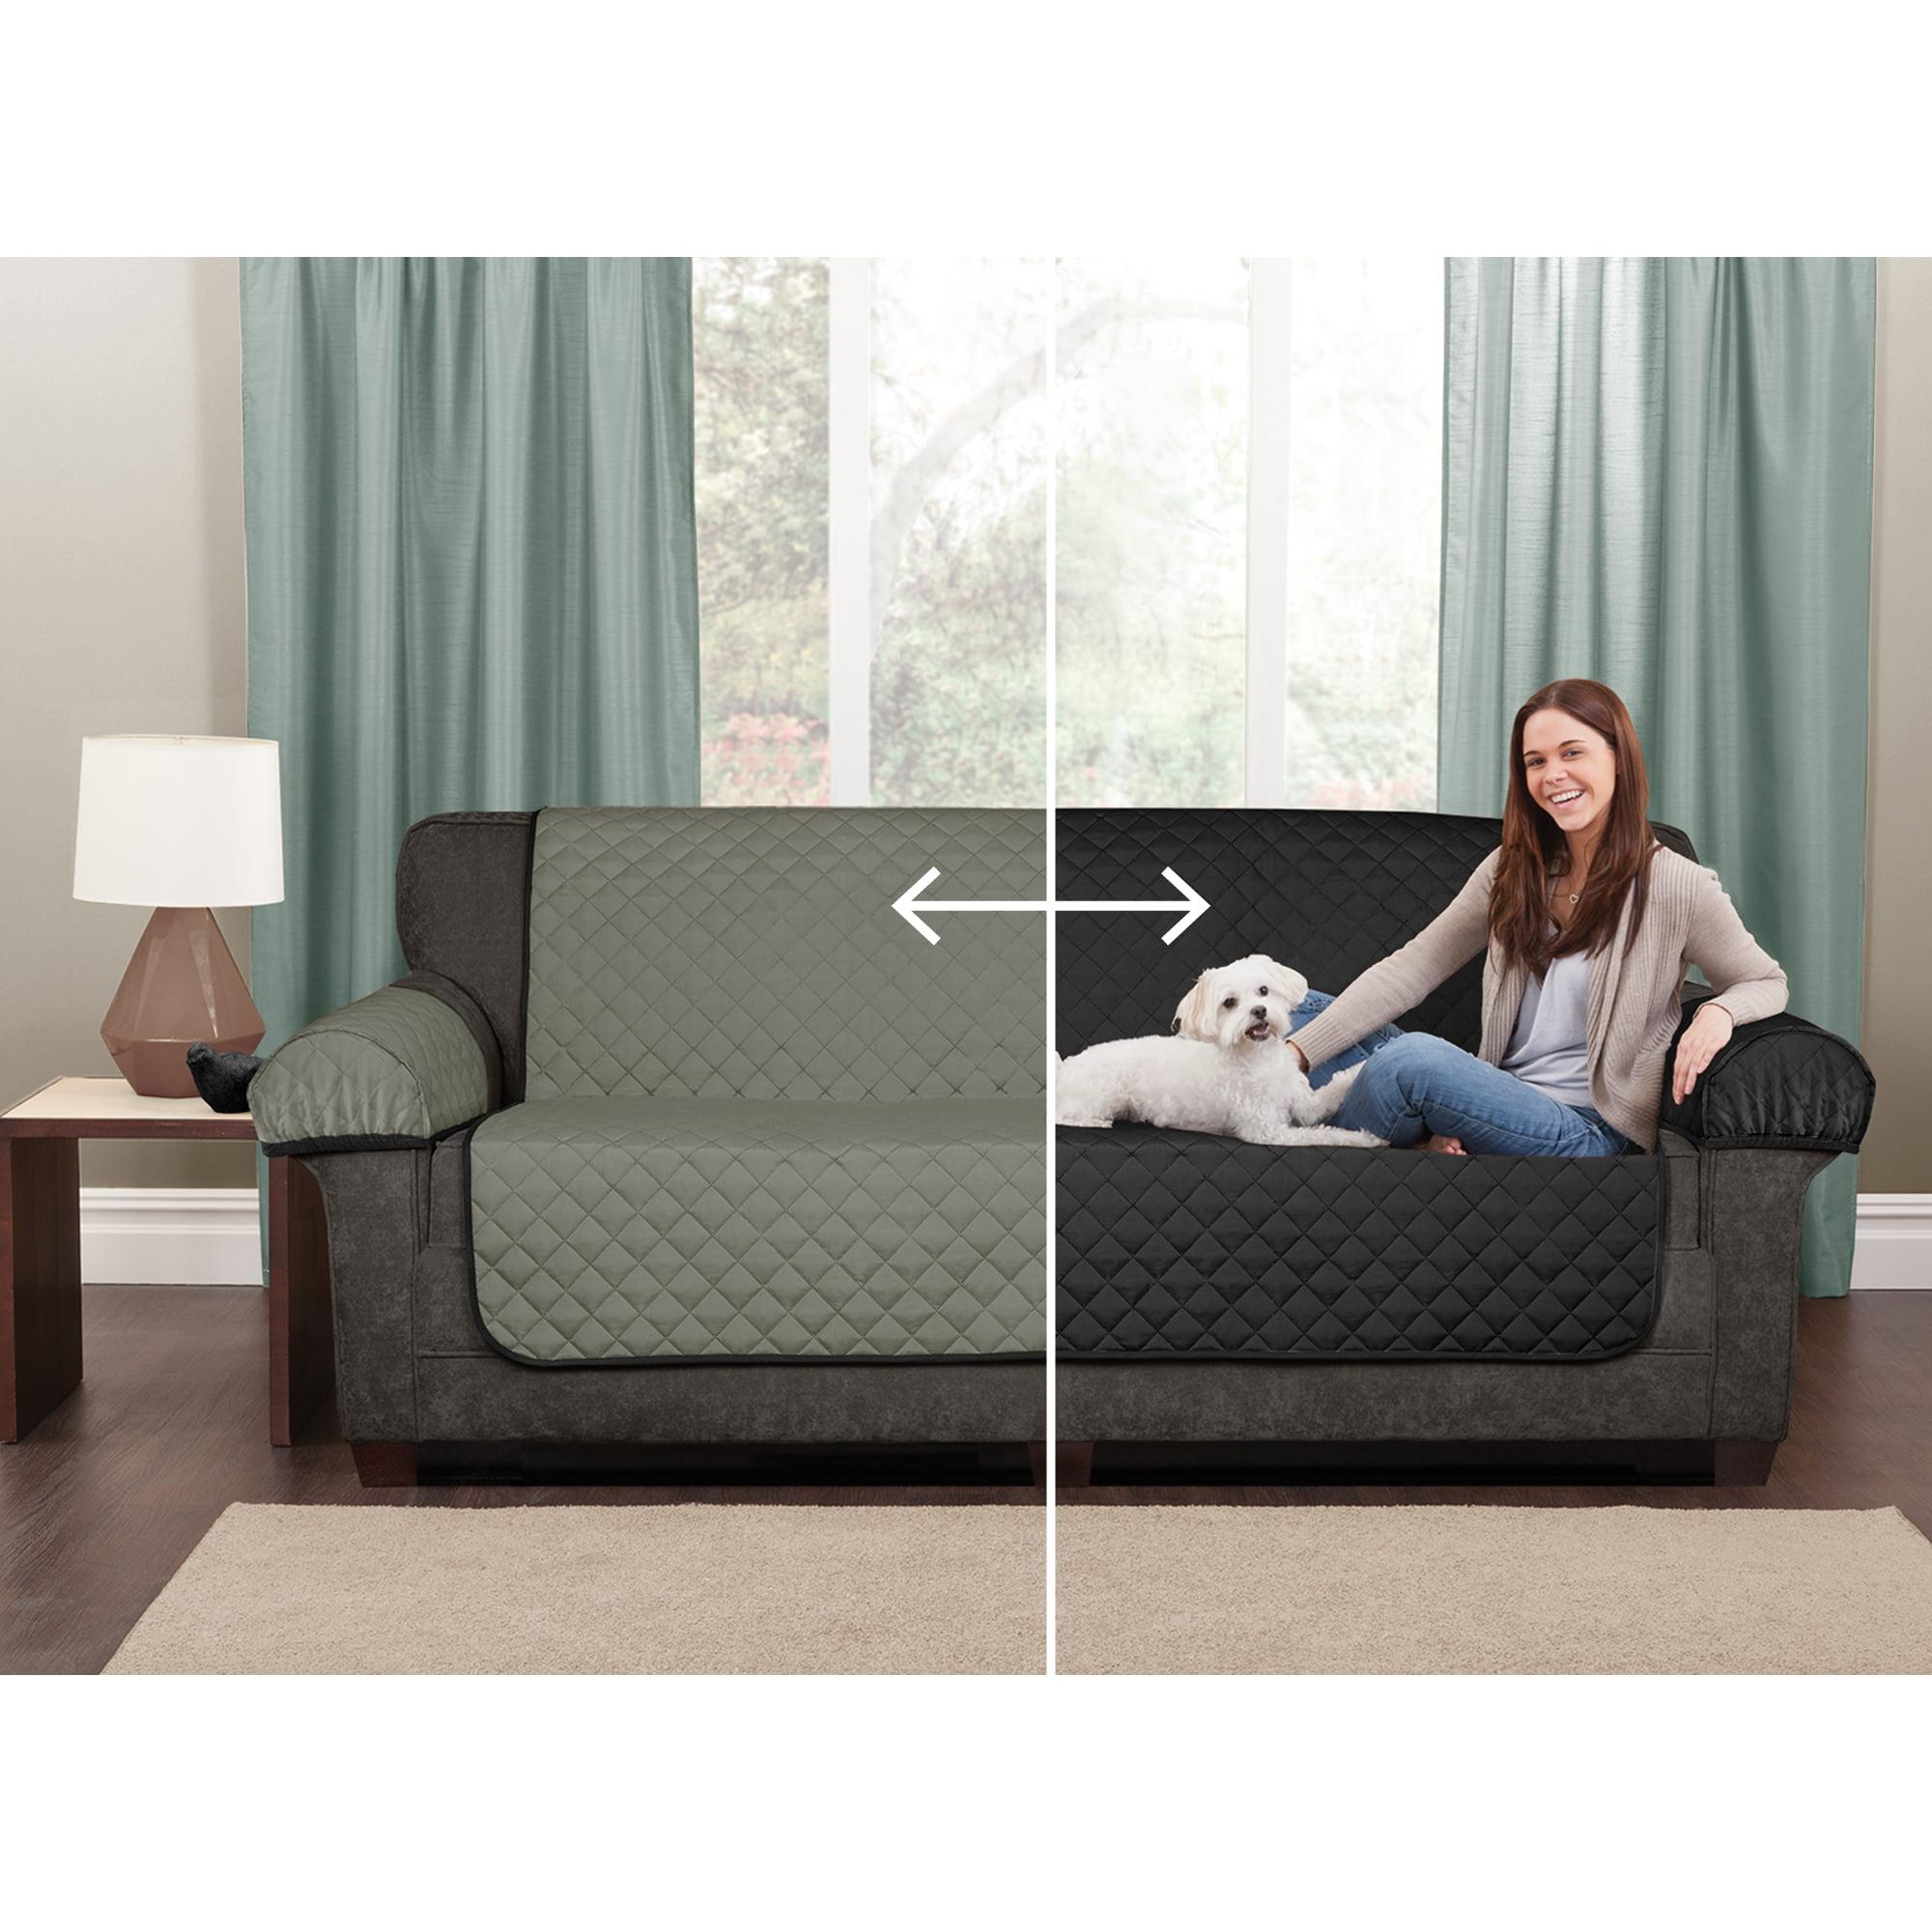 Maytex Reversible 3 Piece Microfiber Sofa Furniture Cover Protector